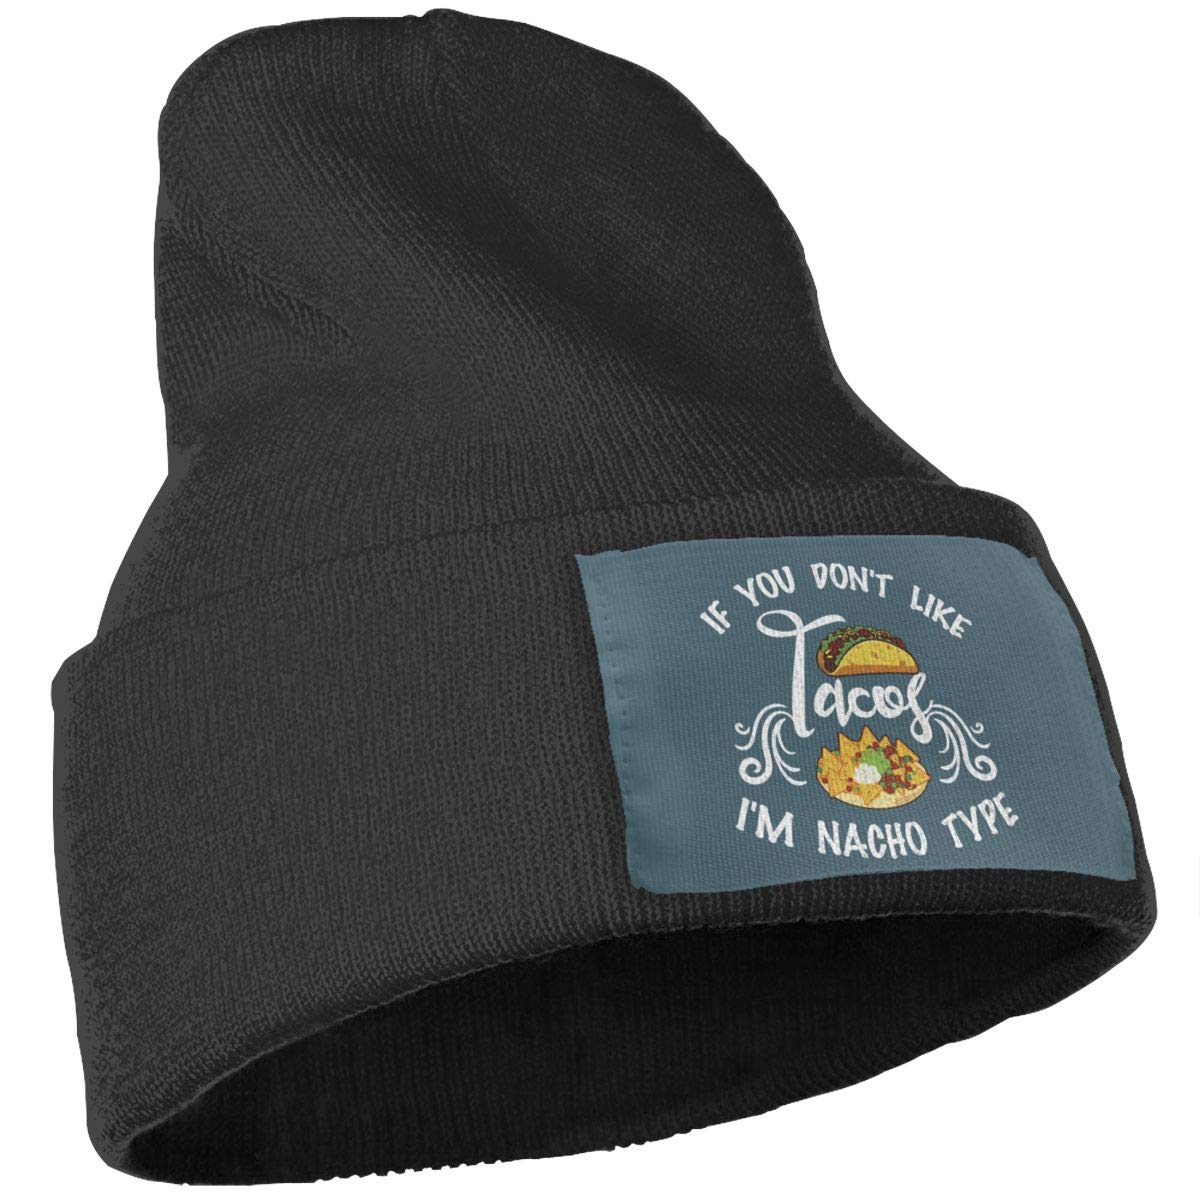 Oopp Jfhg If You Don T Like Tacos Im Nacho Type Wool Cap Beanies Caps Unisex Winter